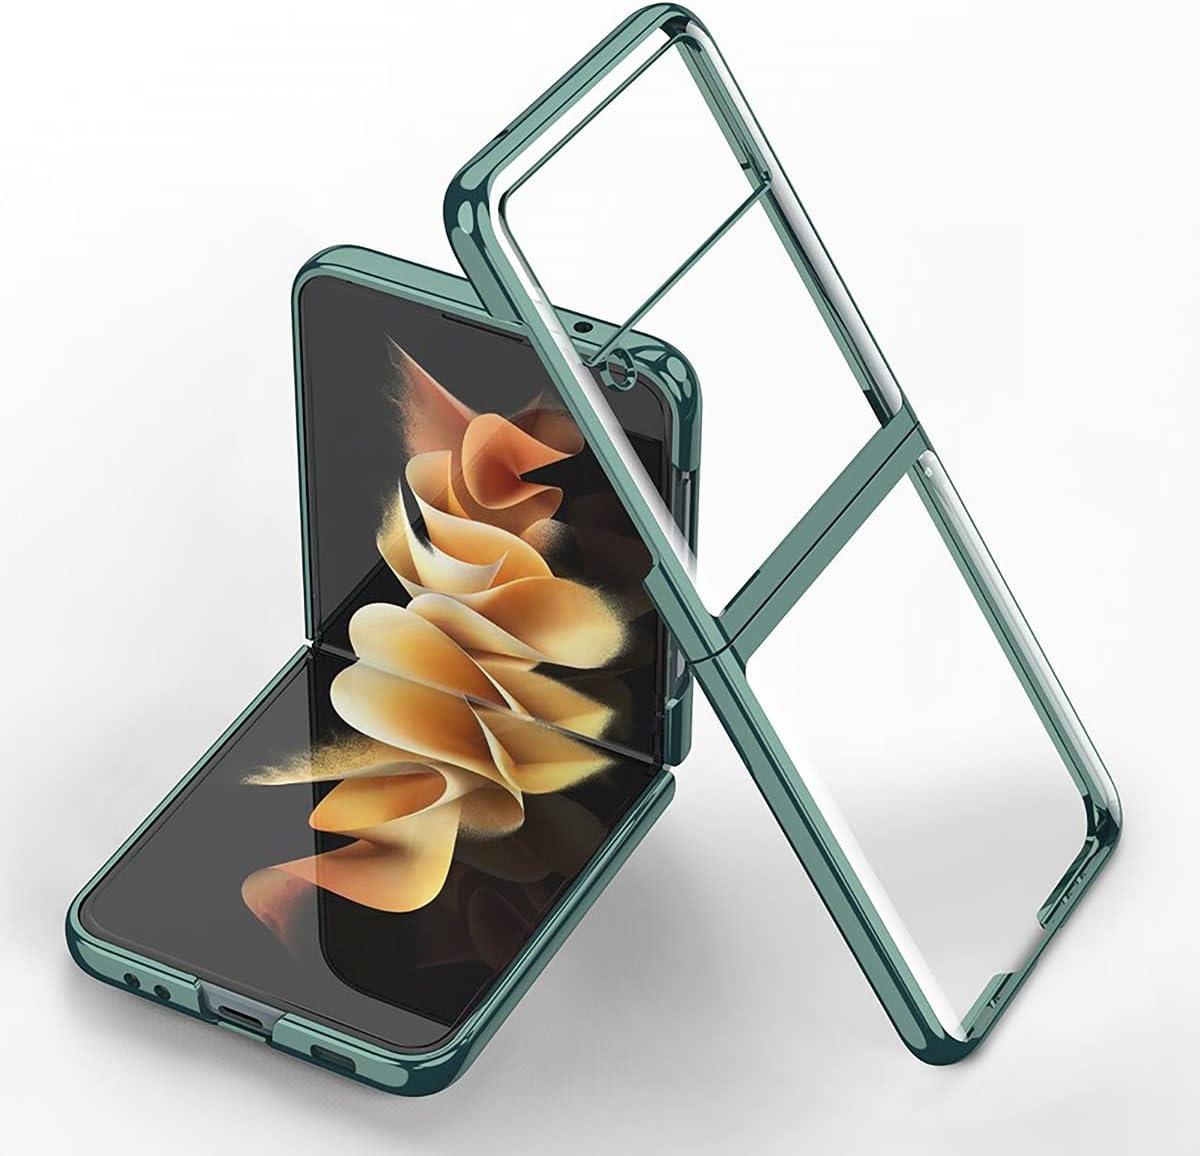 FUTURECASE Z Flip 3 Case, Galaxy Z Flip 3 Case, Samsung z Flip 3 Case, Clear Crystal Transparent Plating Case for Samsung Galaxy z Flip 3 5G ZFlip 3 ZFlip3 Z Flip3 Coque Funda Phone Cover(Green)